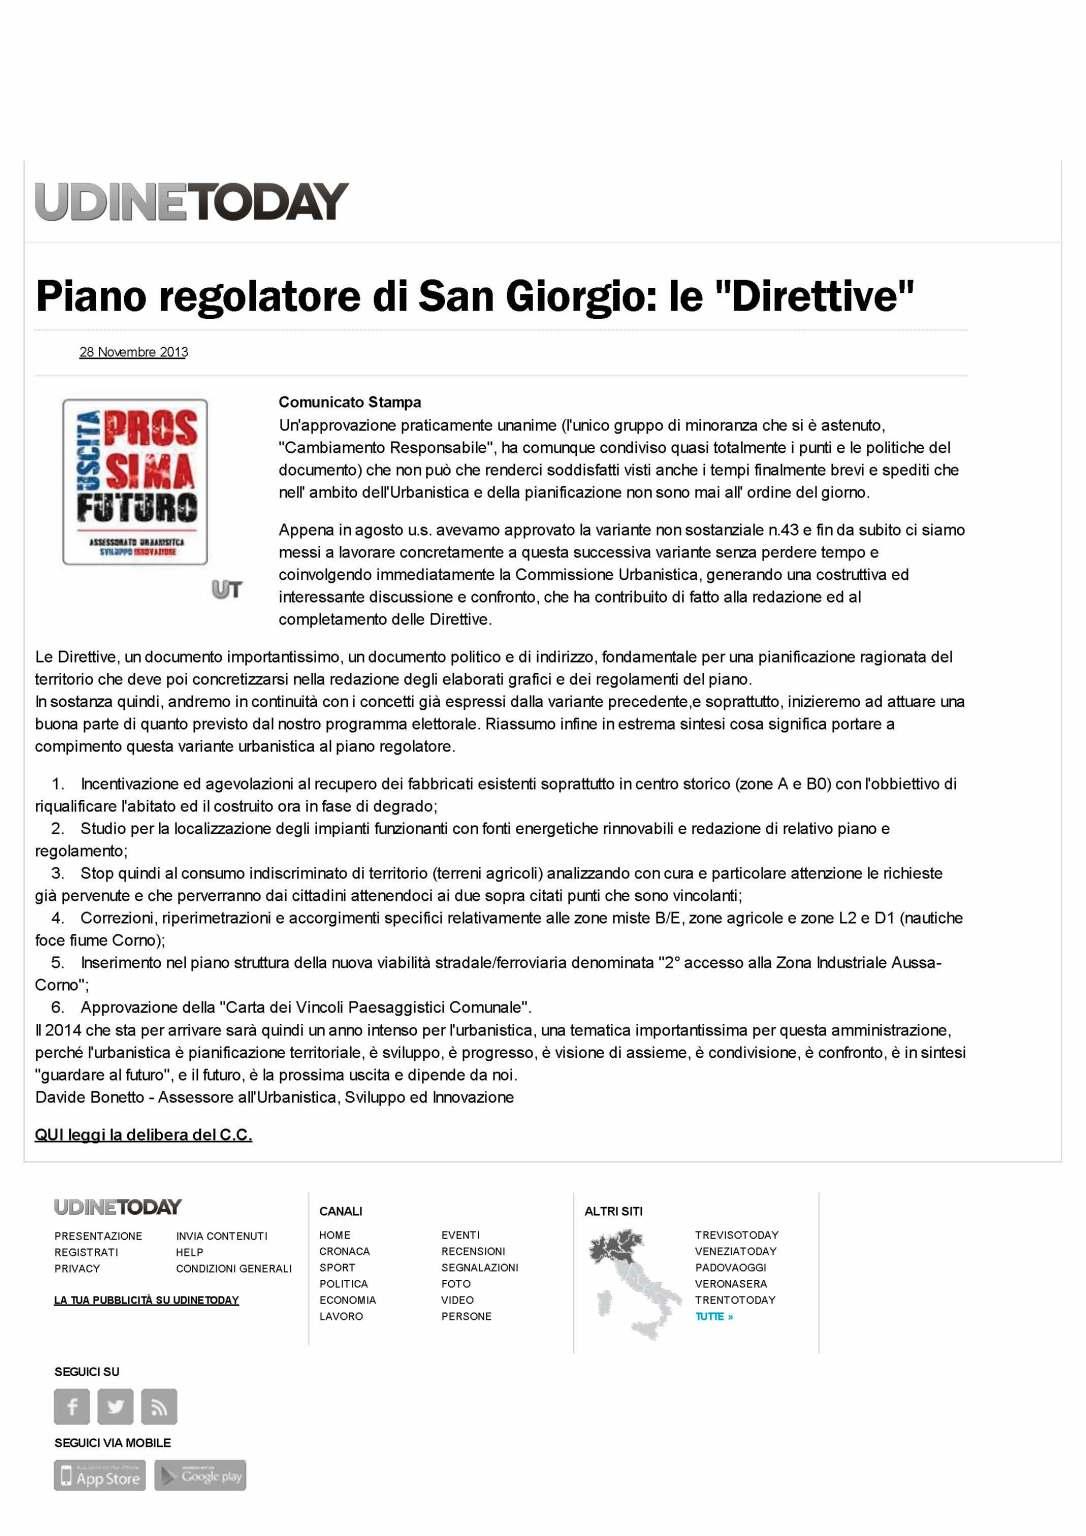 UdineToday 18.11.2013